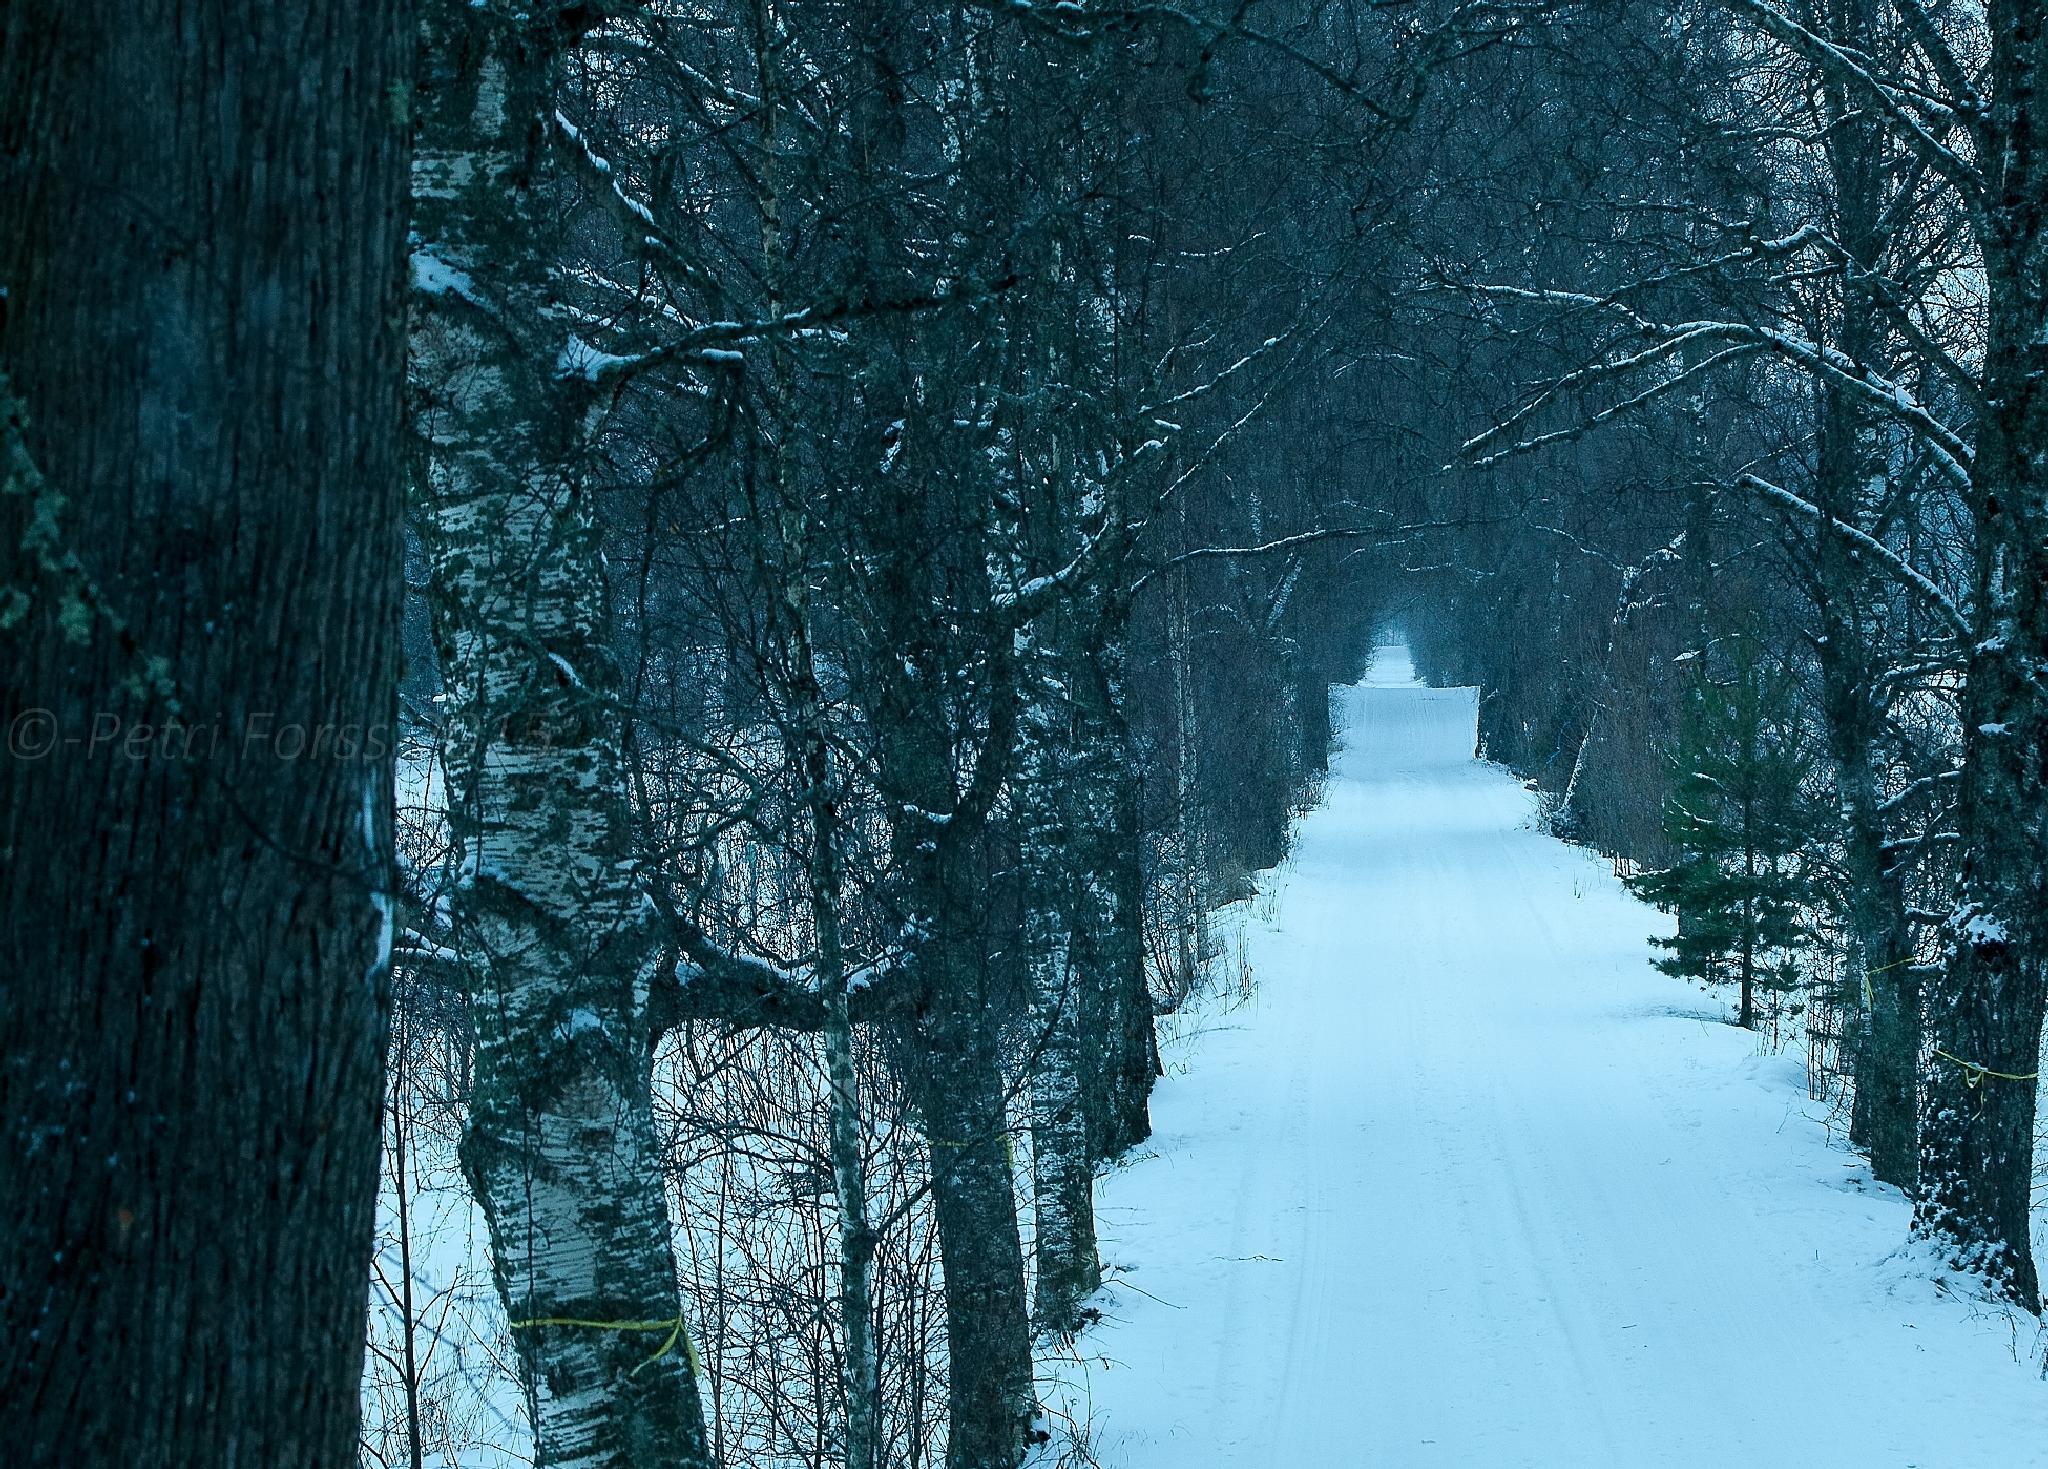 Birch alley by Petri Forss